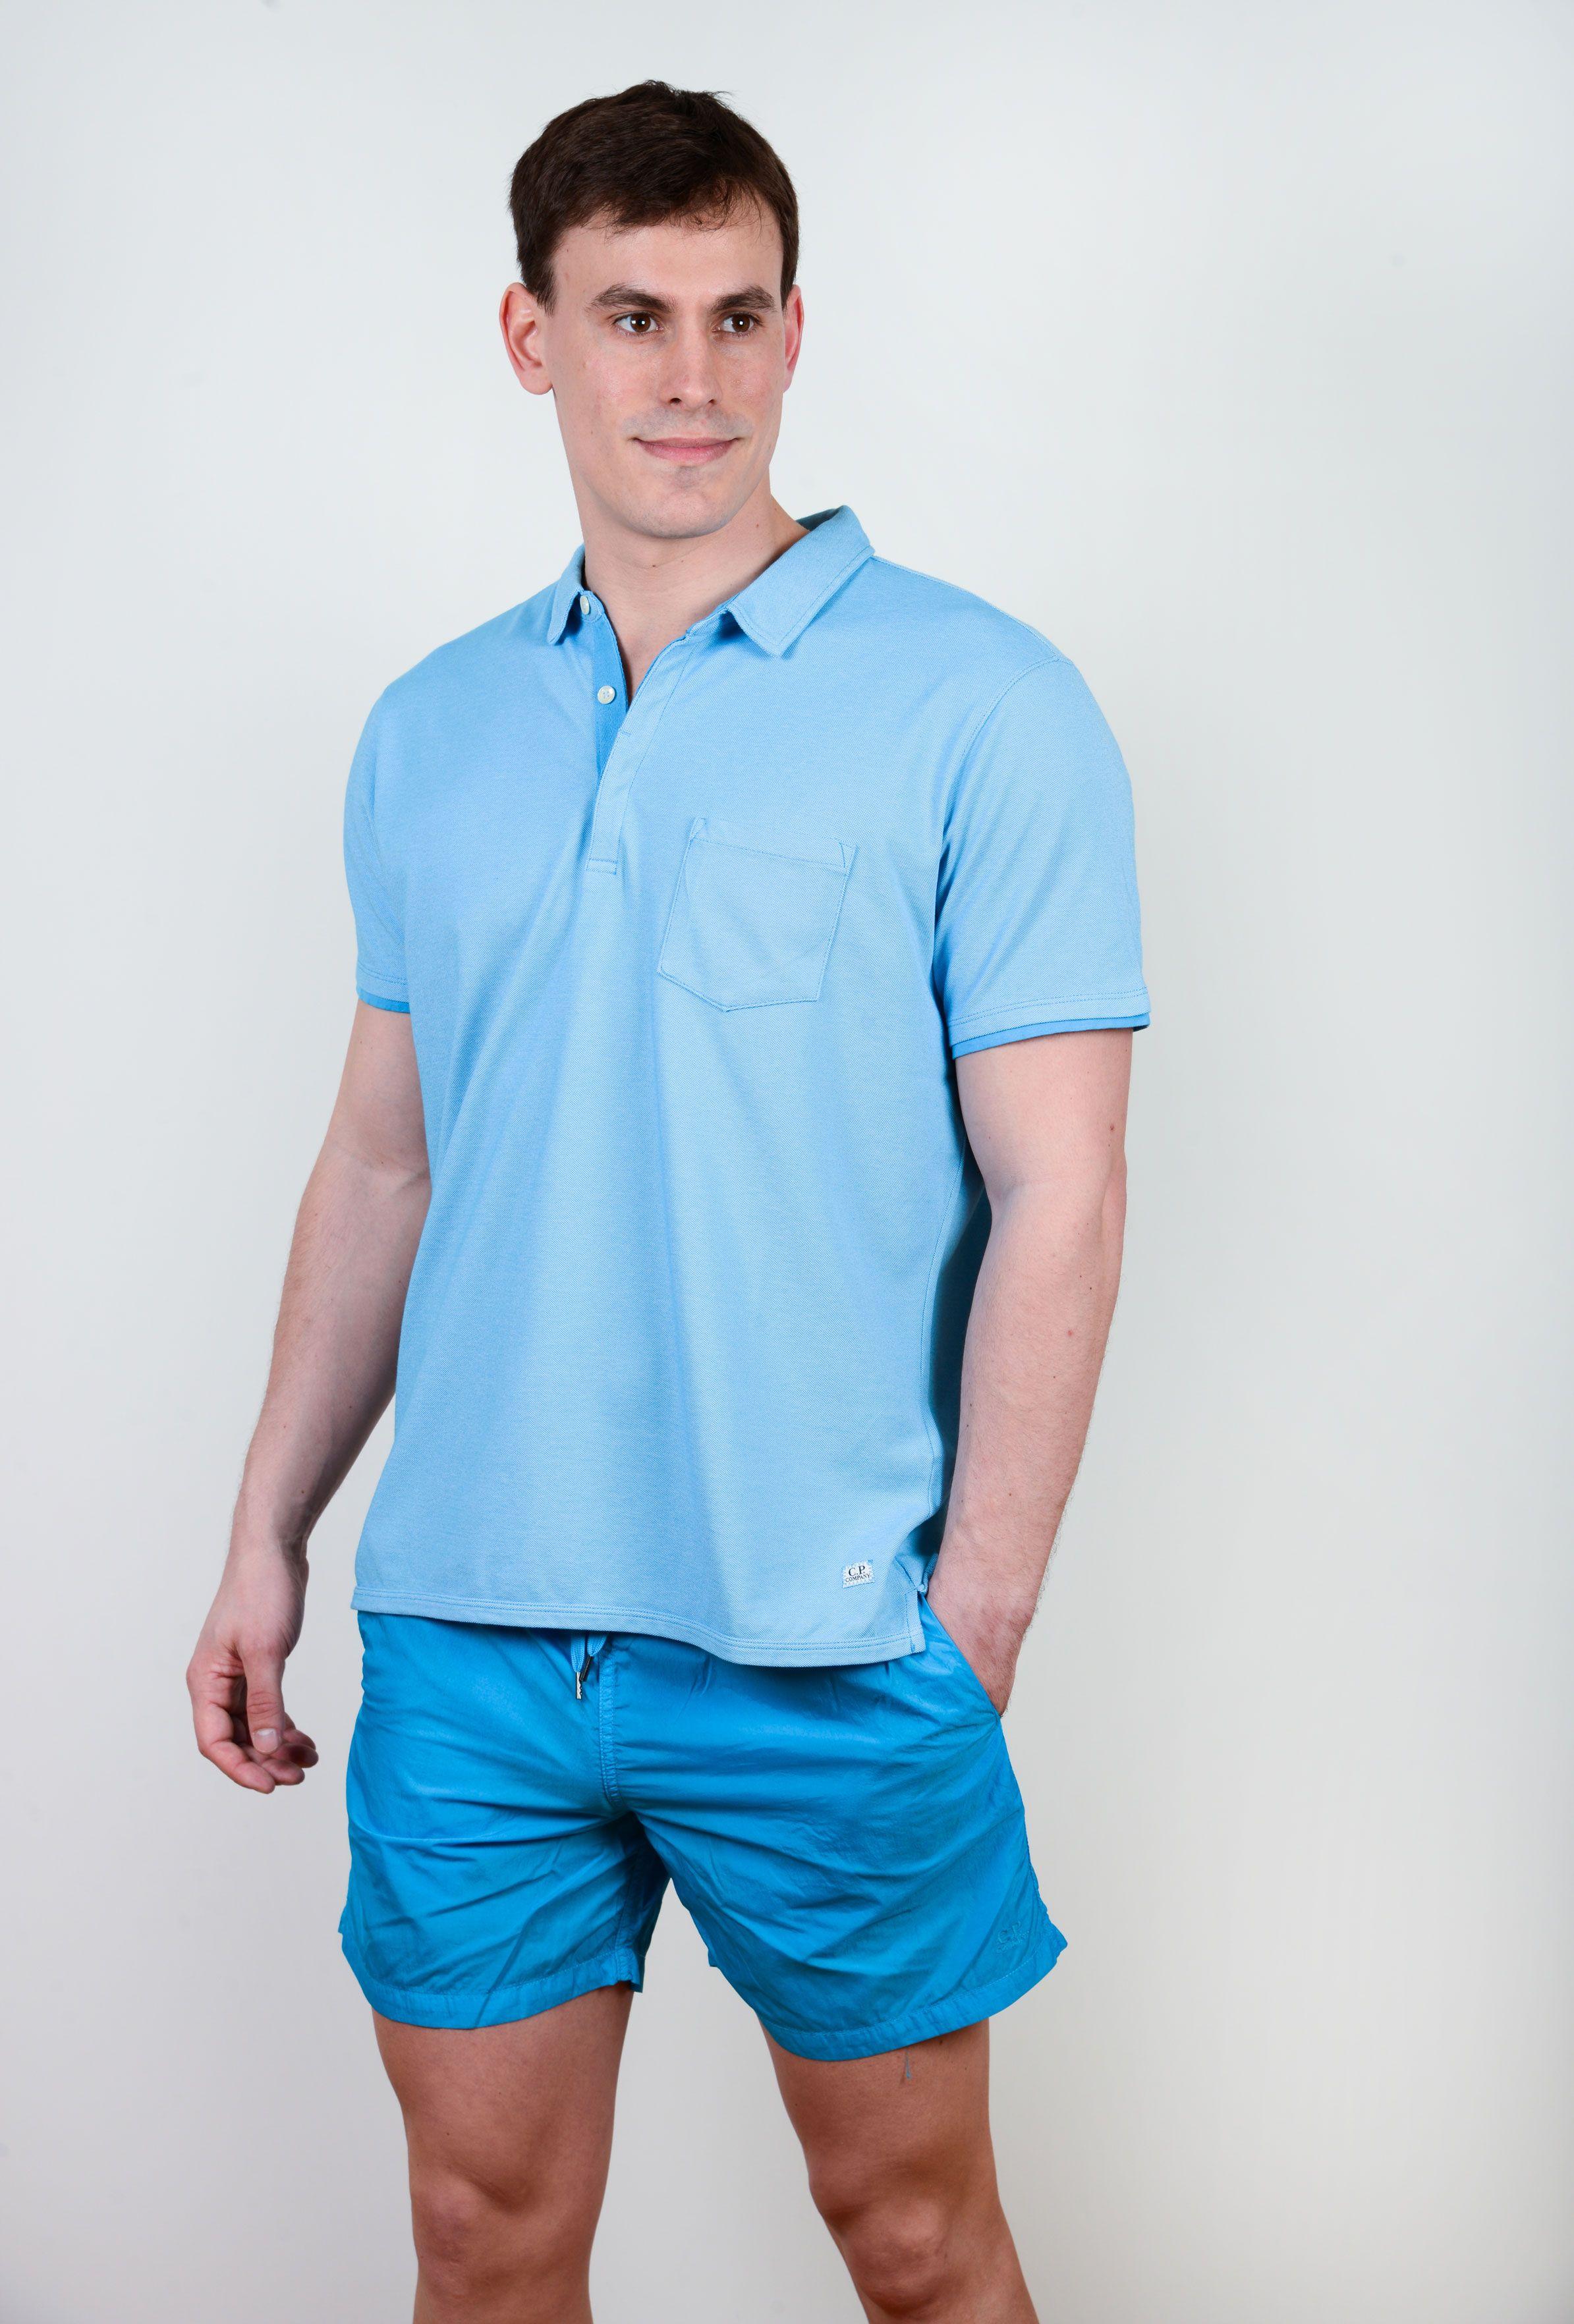 Poloshow poloshirt C.P.Compamy blau 02CMPL018A000373G 8